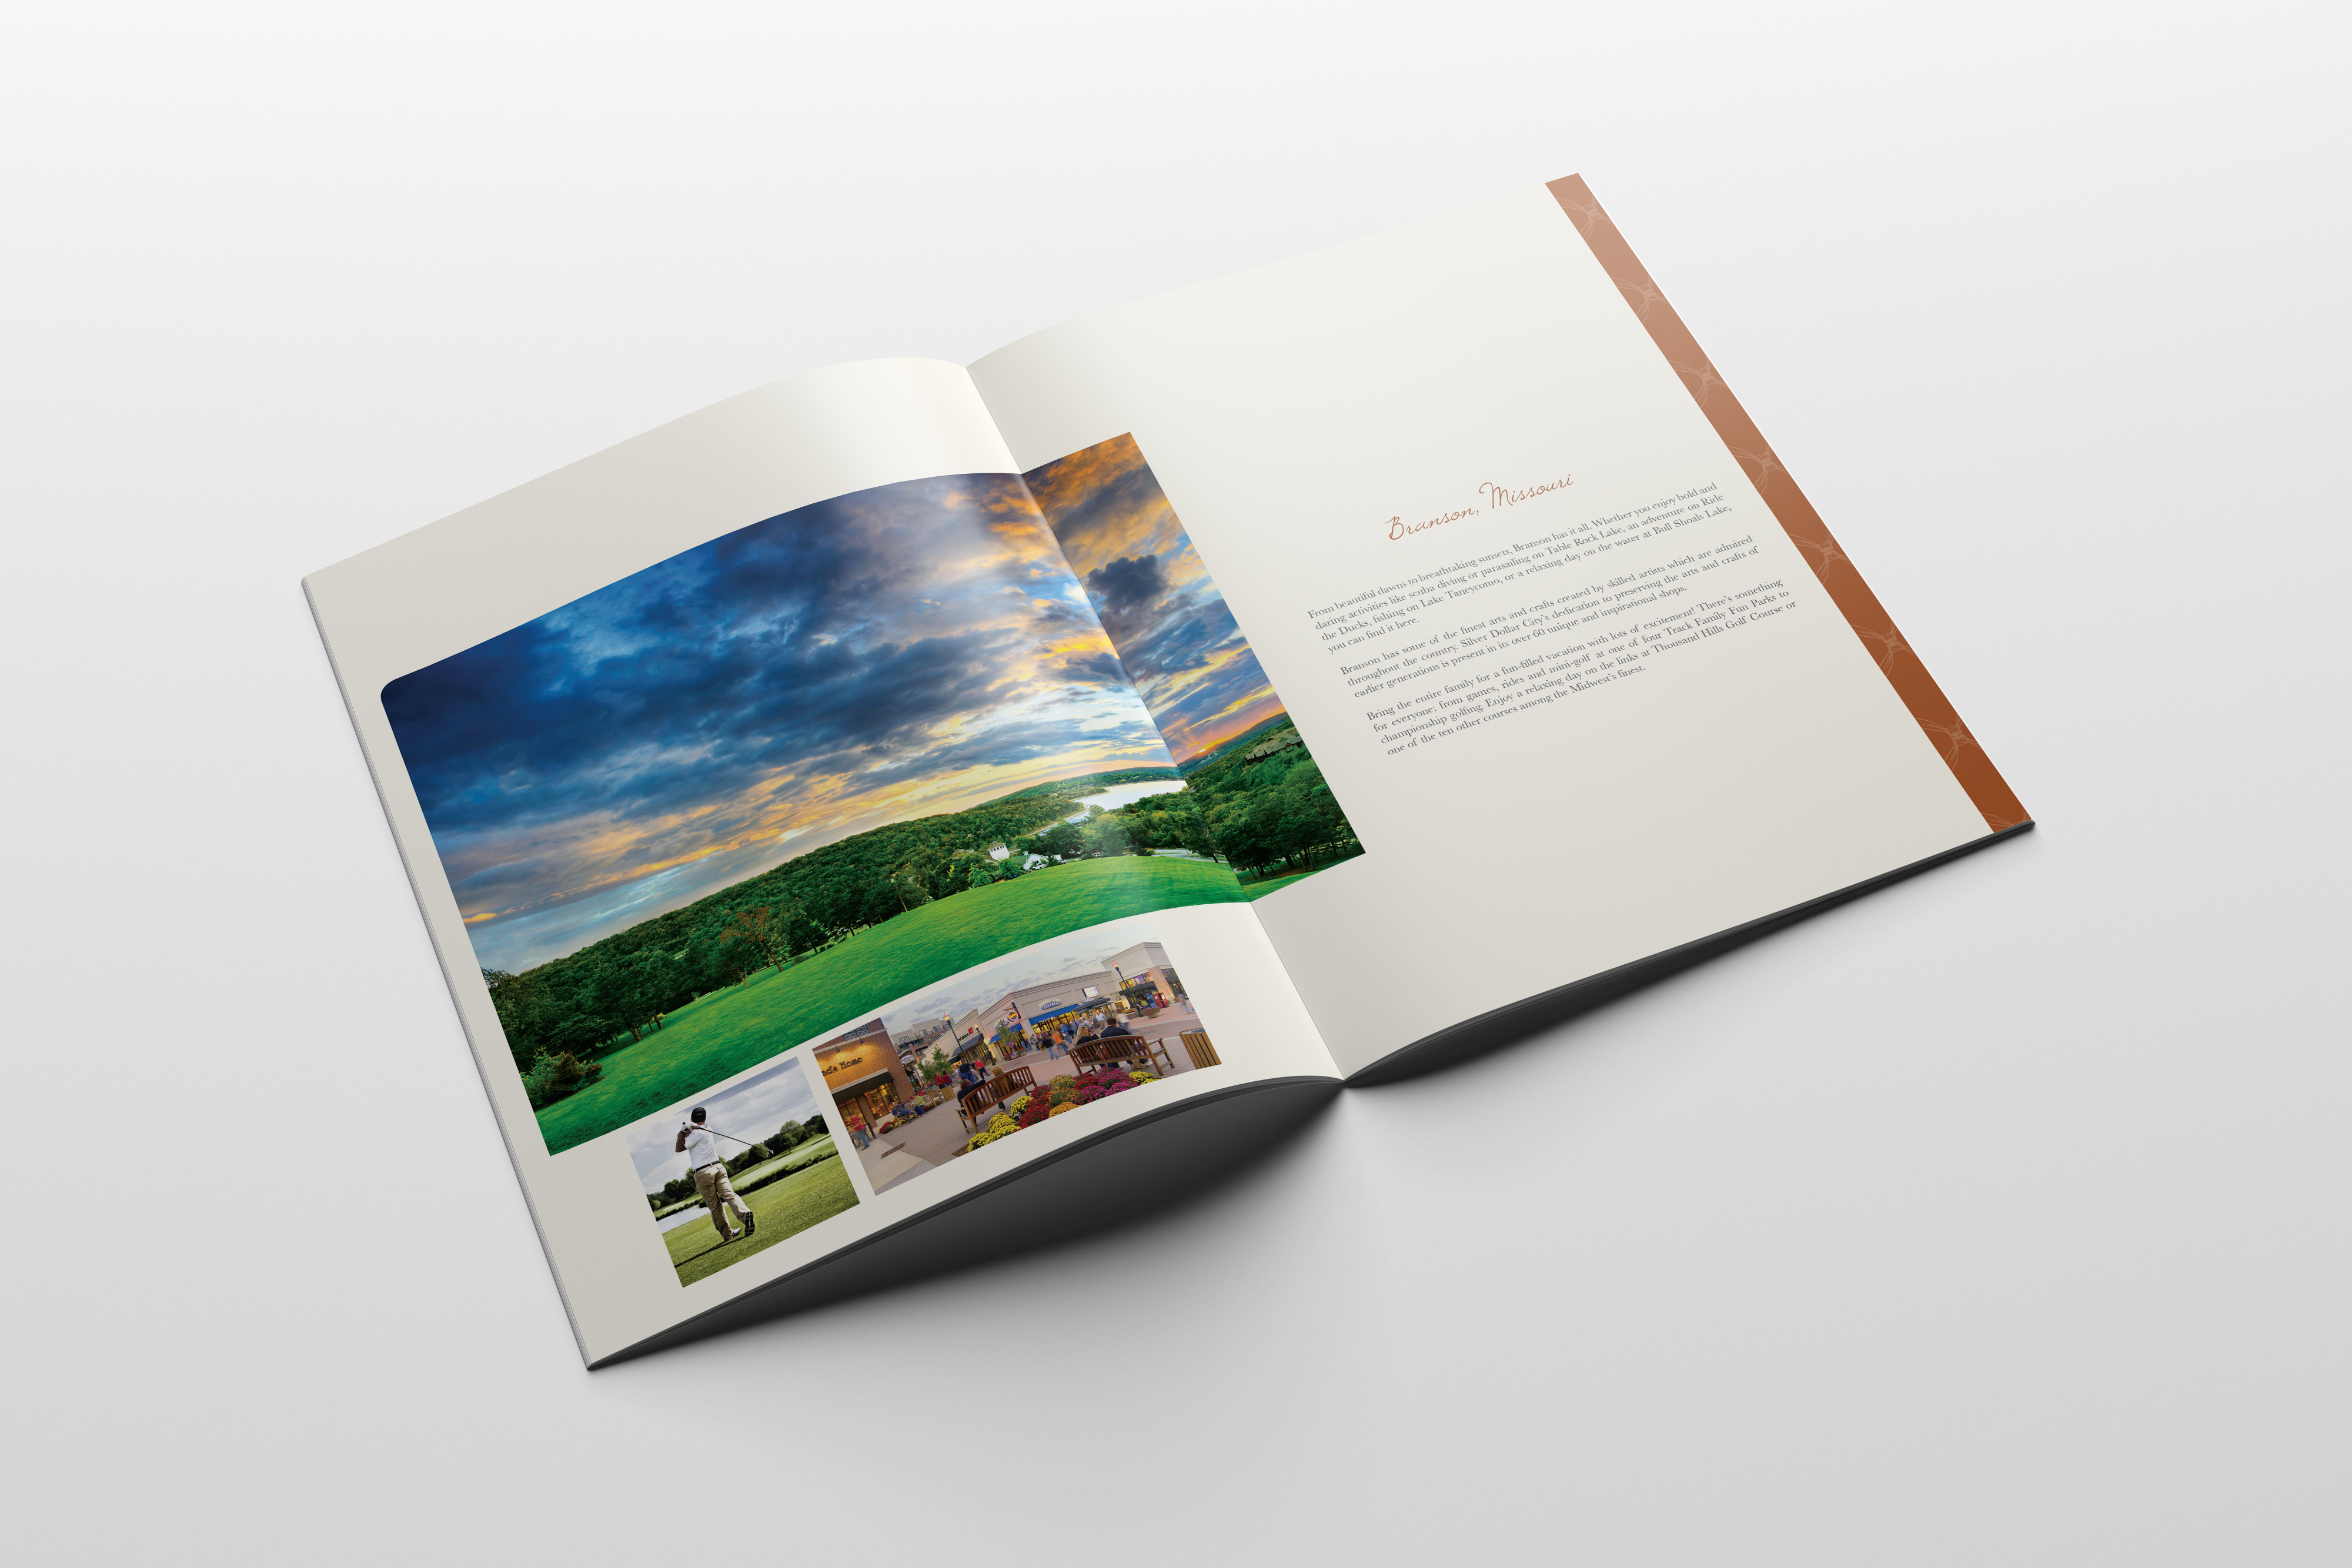 Capital Resorts publication inside